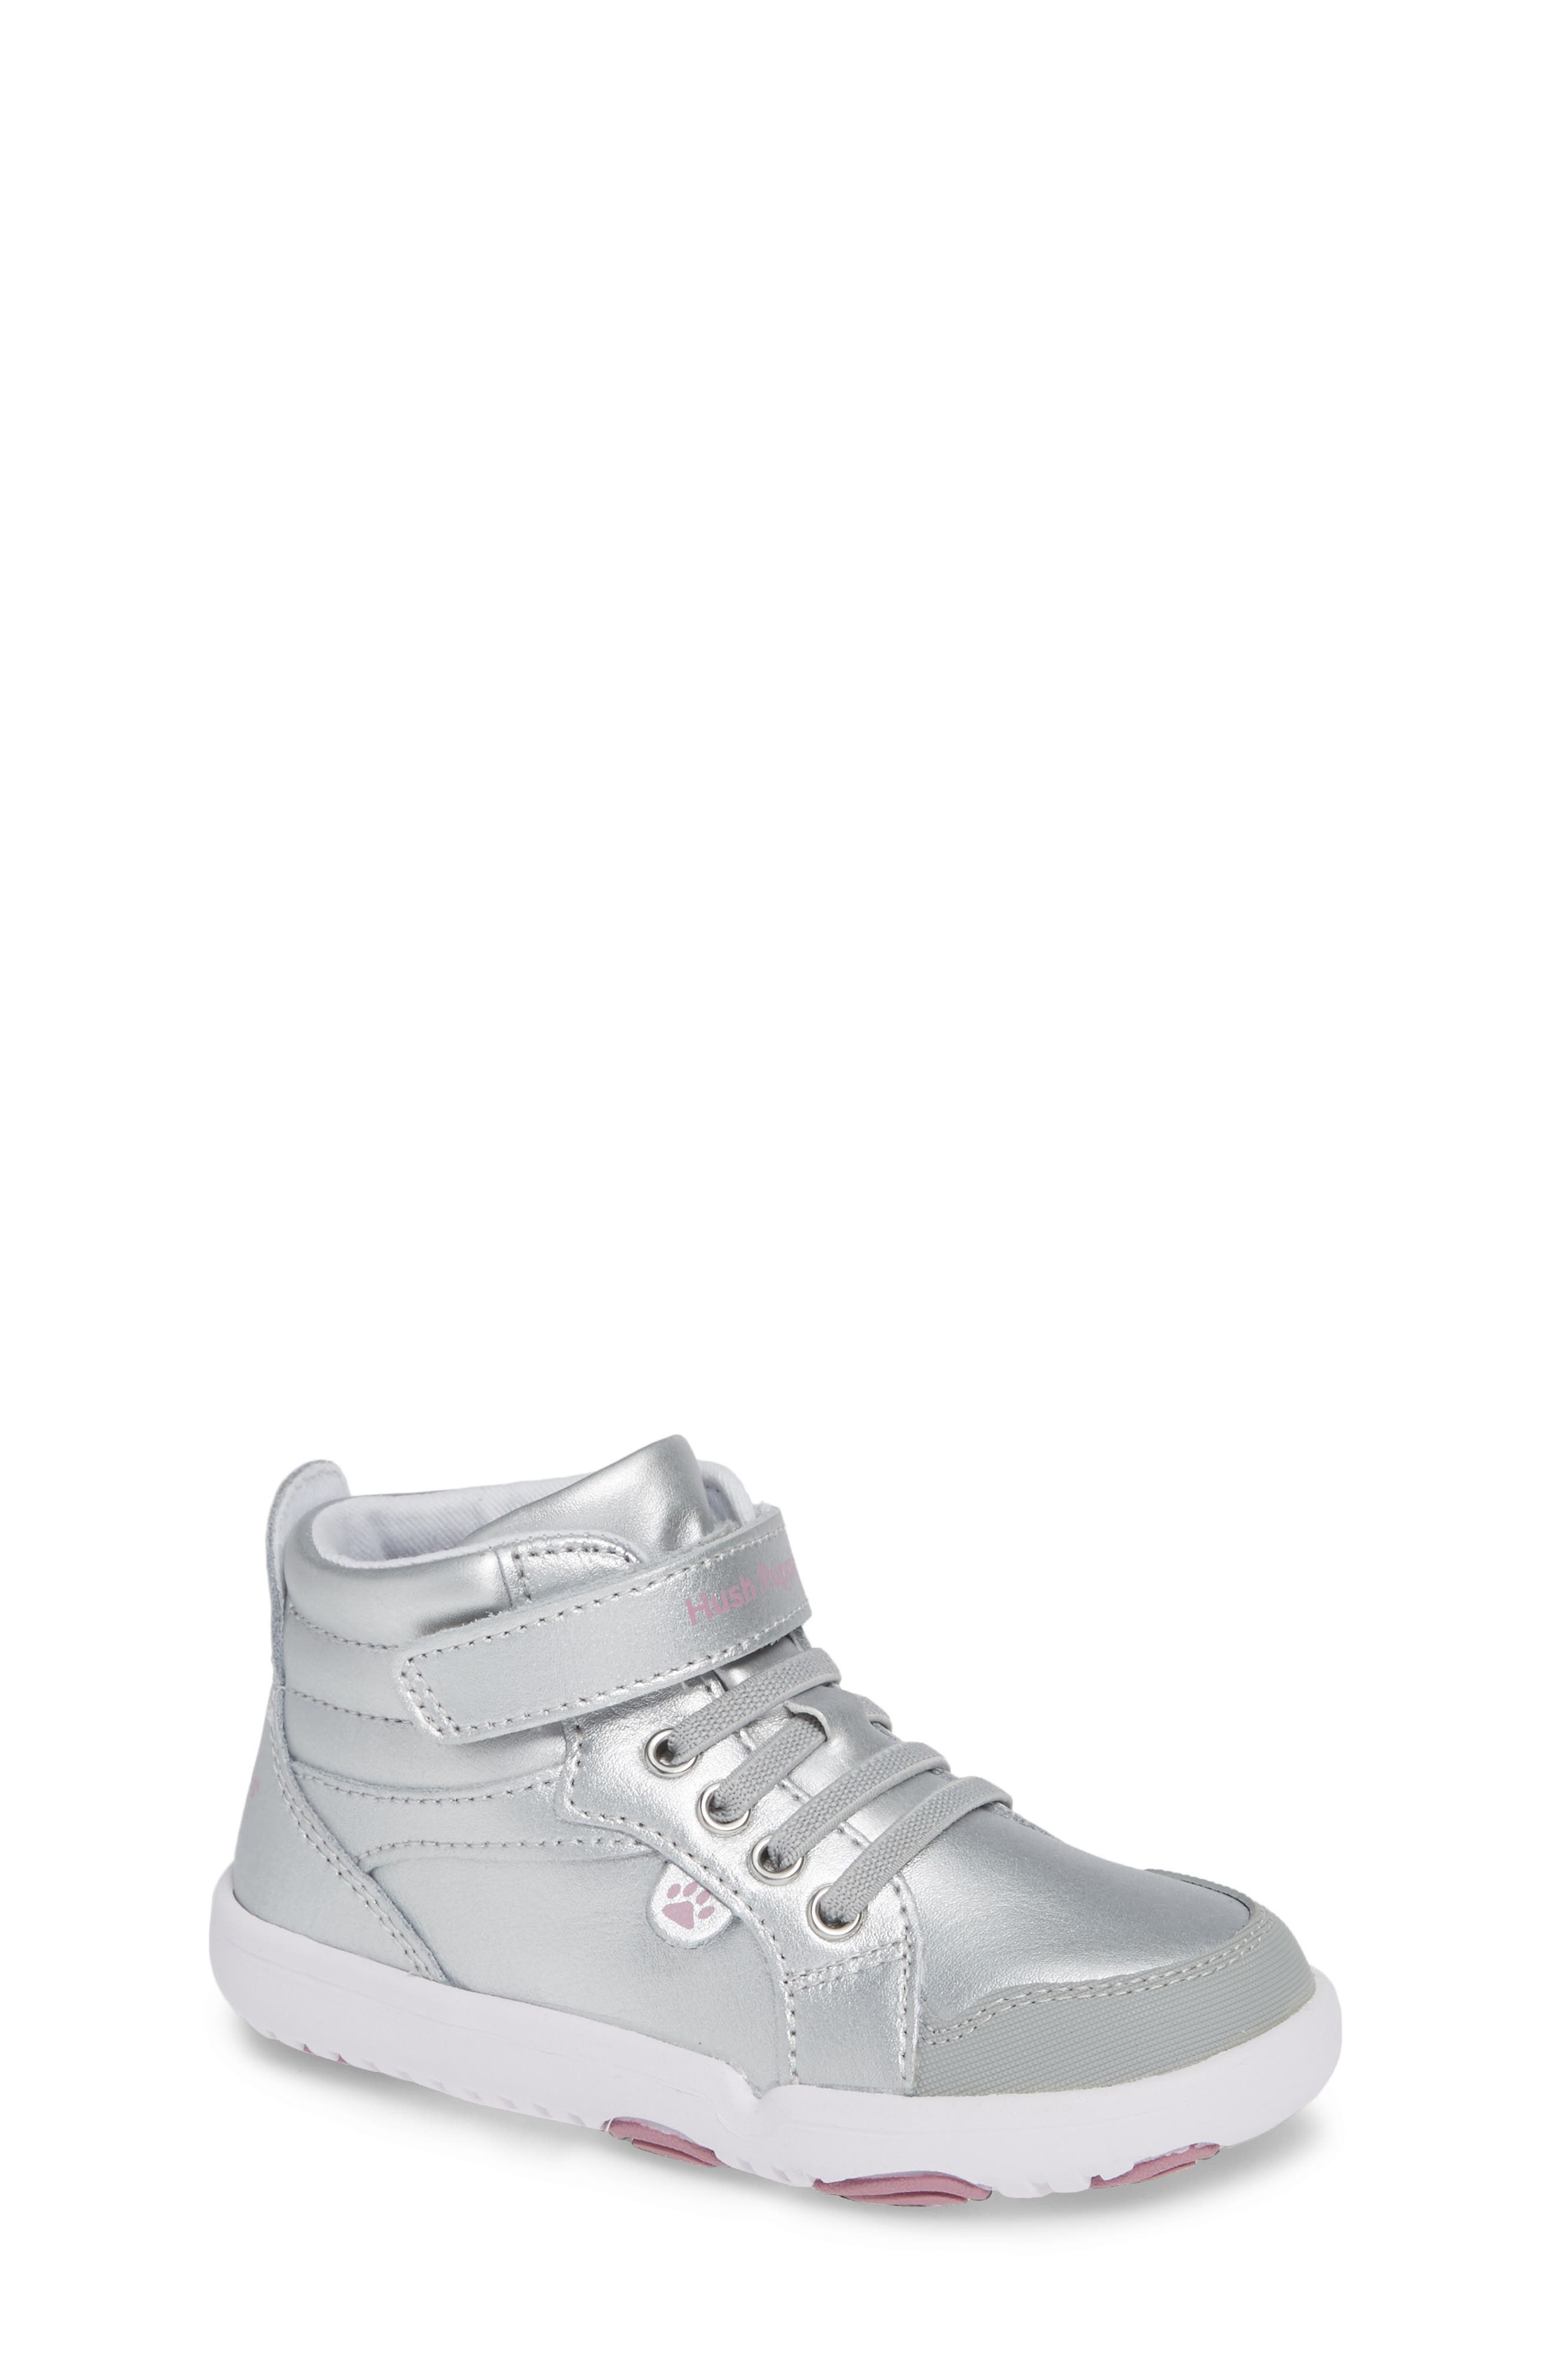 Buddy High Top Sneaker,                             Main thumbnail 1, color,                             SILVER